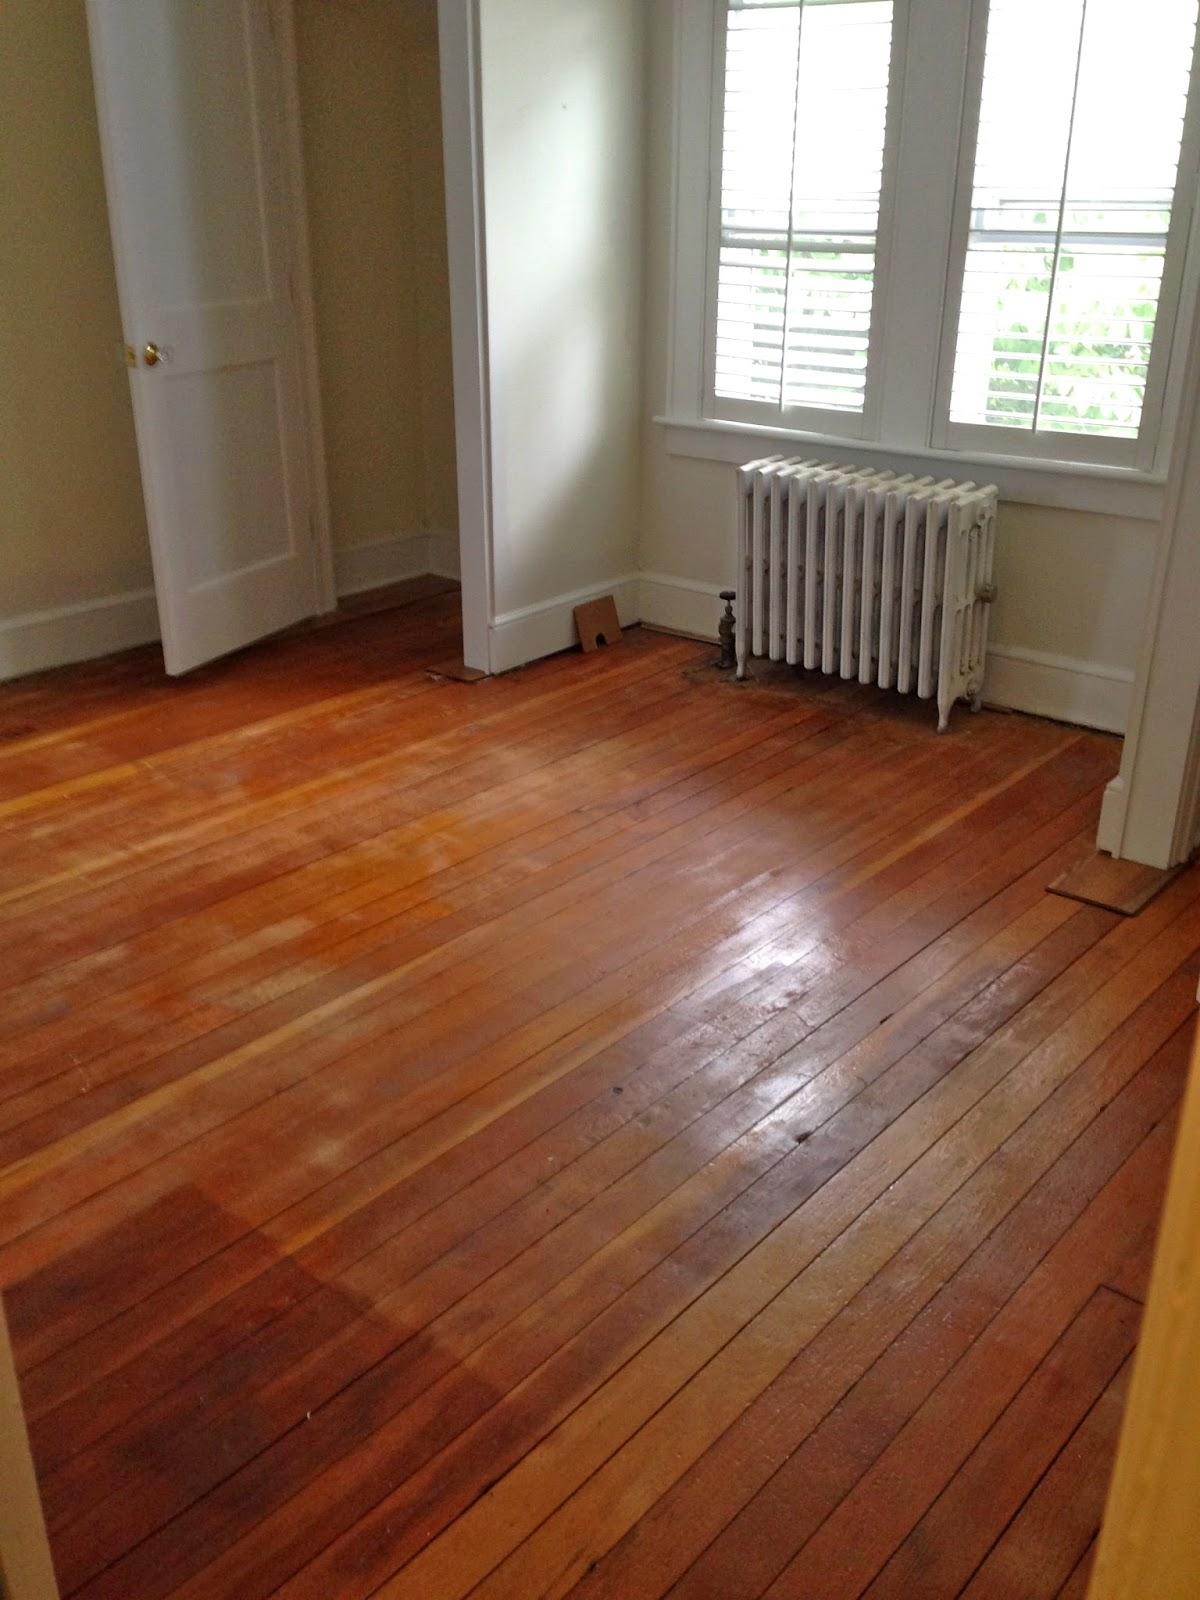 refinishing old hardwood floors. Black Bedroom Furniture Sets. Home Design Ideas